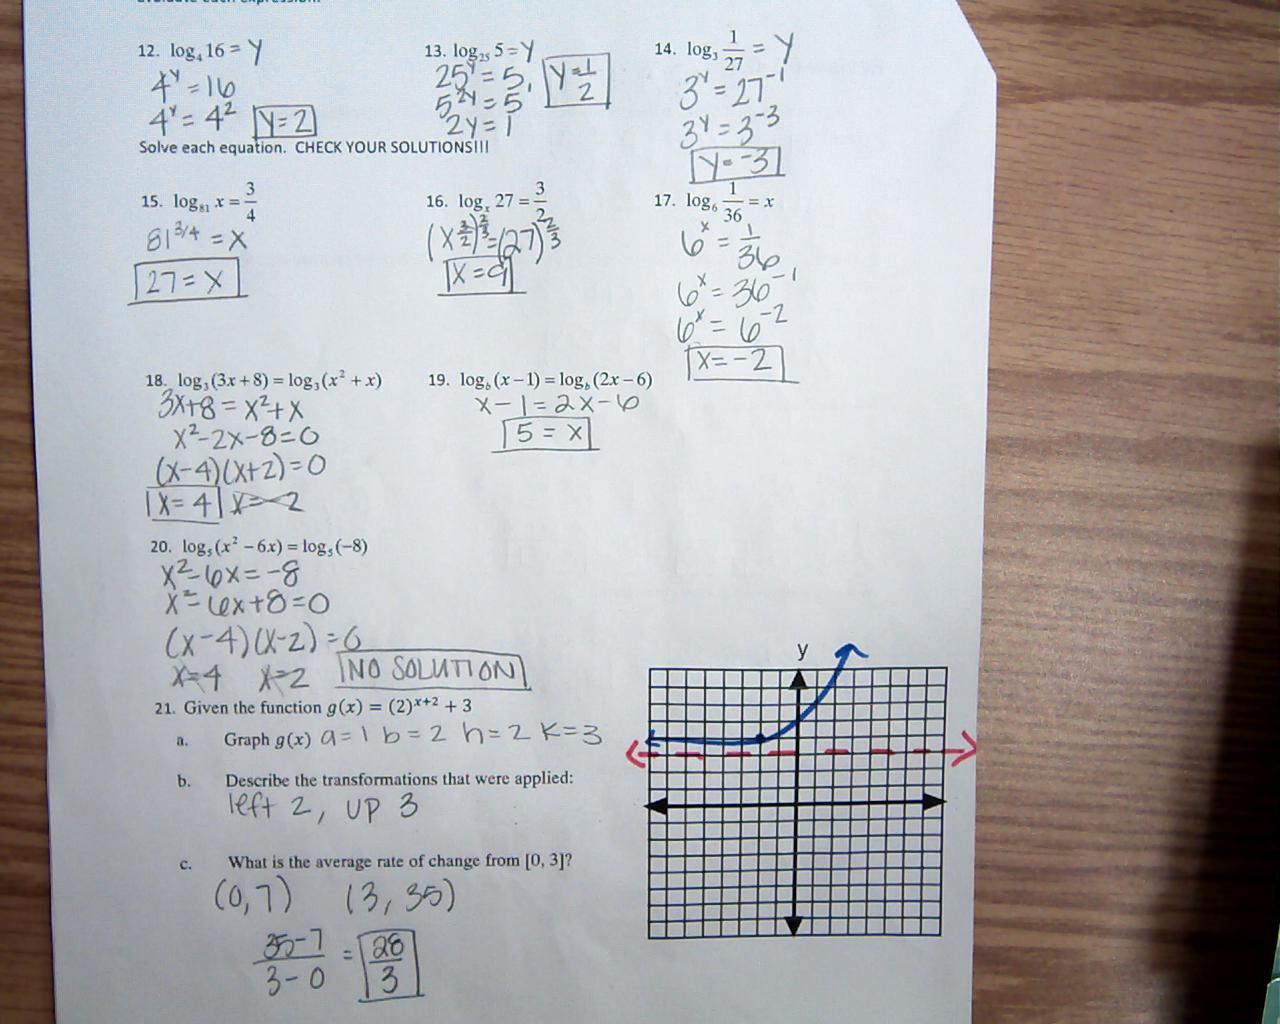 Algebra ii unit 8 reveiw   Custom paper Service - tapapertisf ...